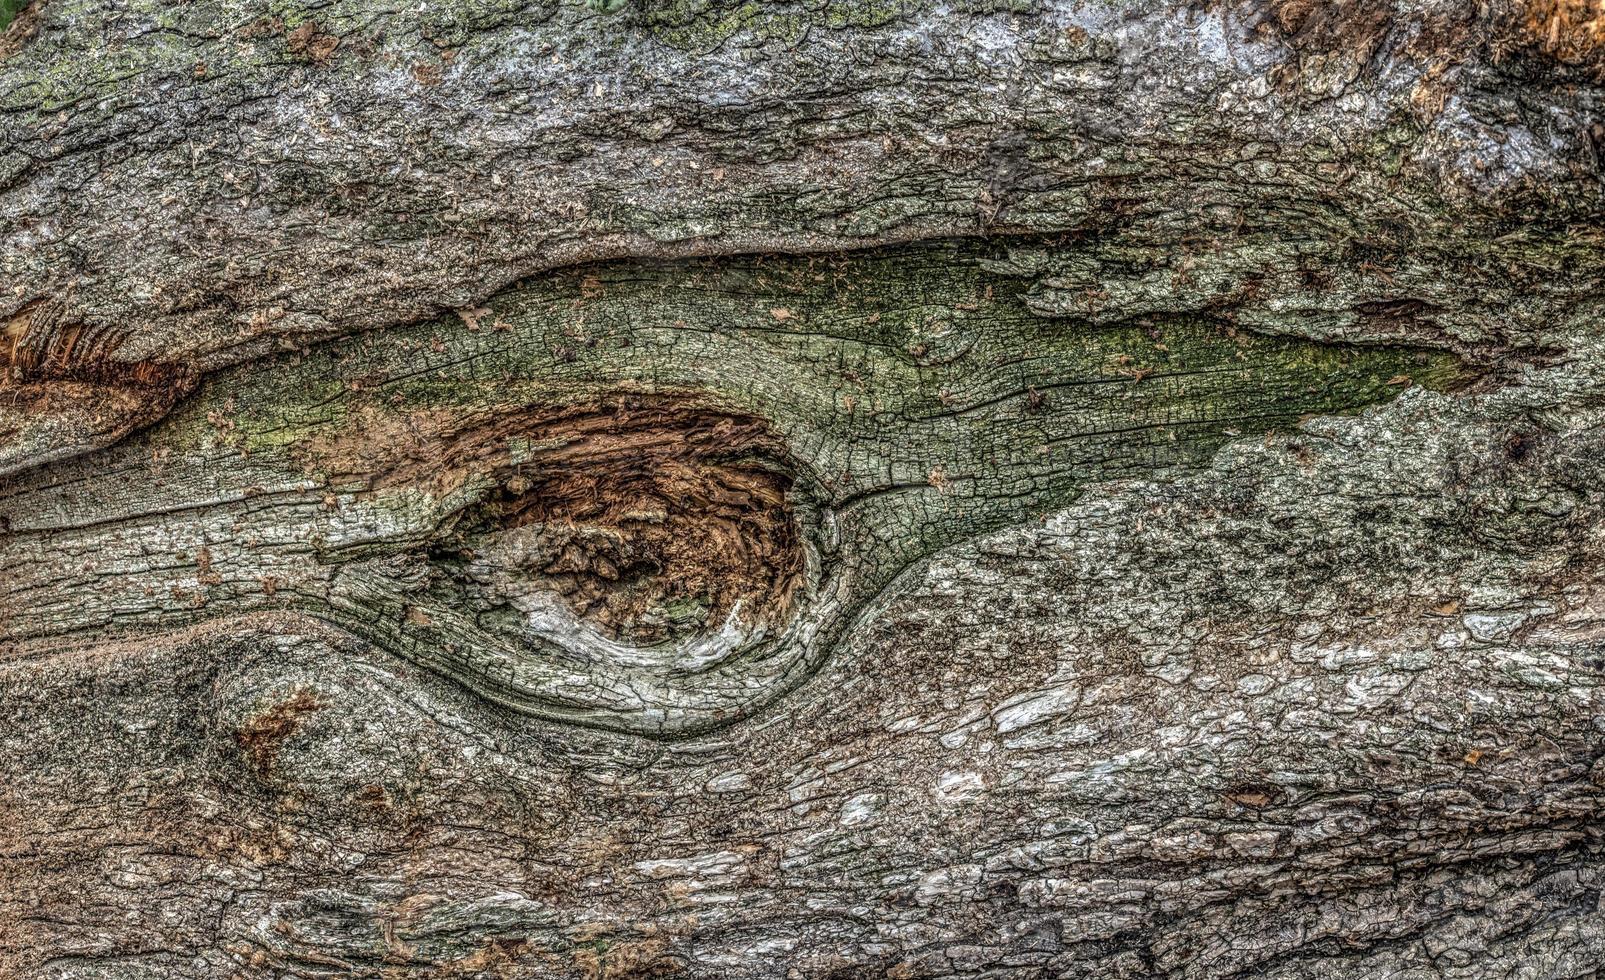 Close up of log photo